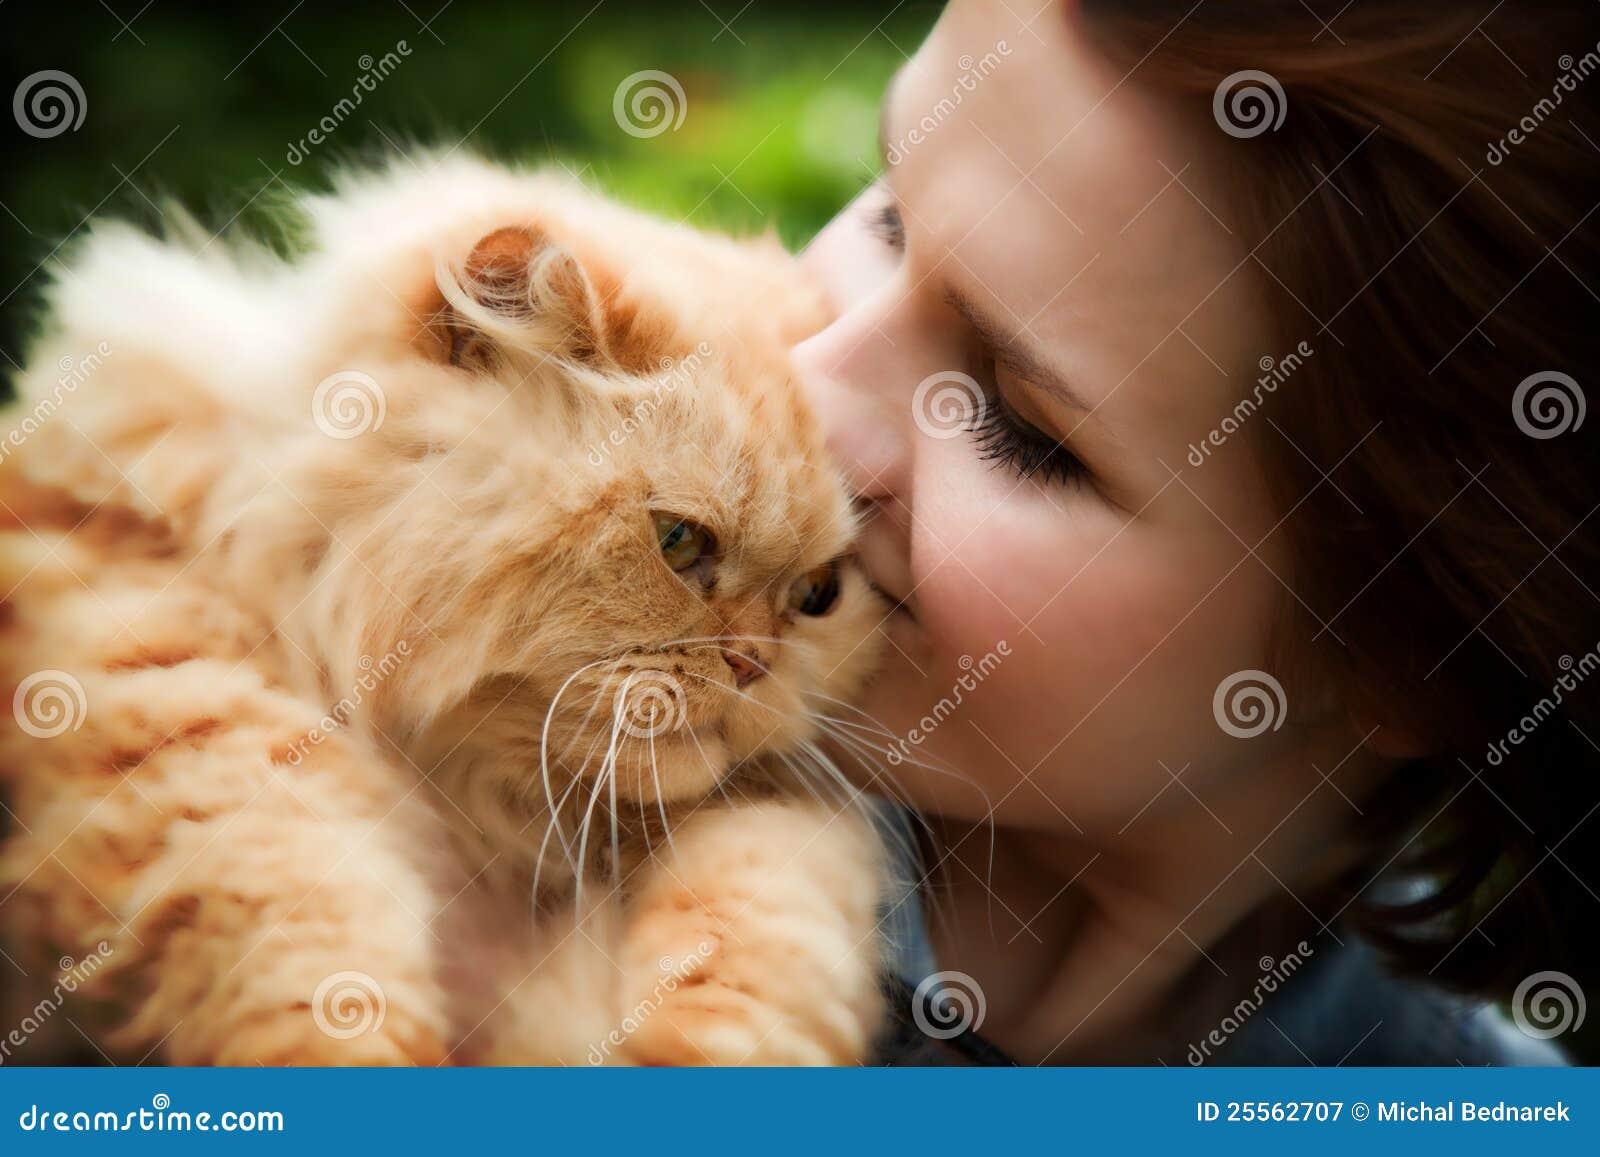 Katze mit Frau Muschi